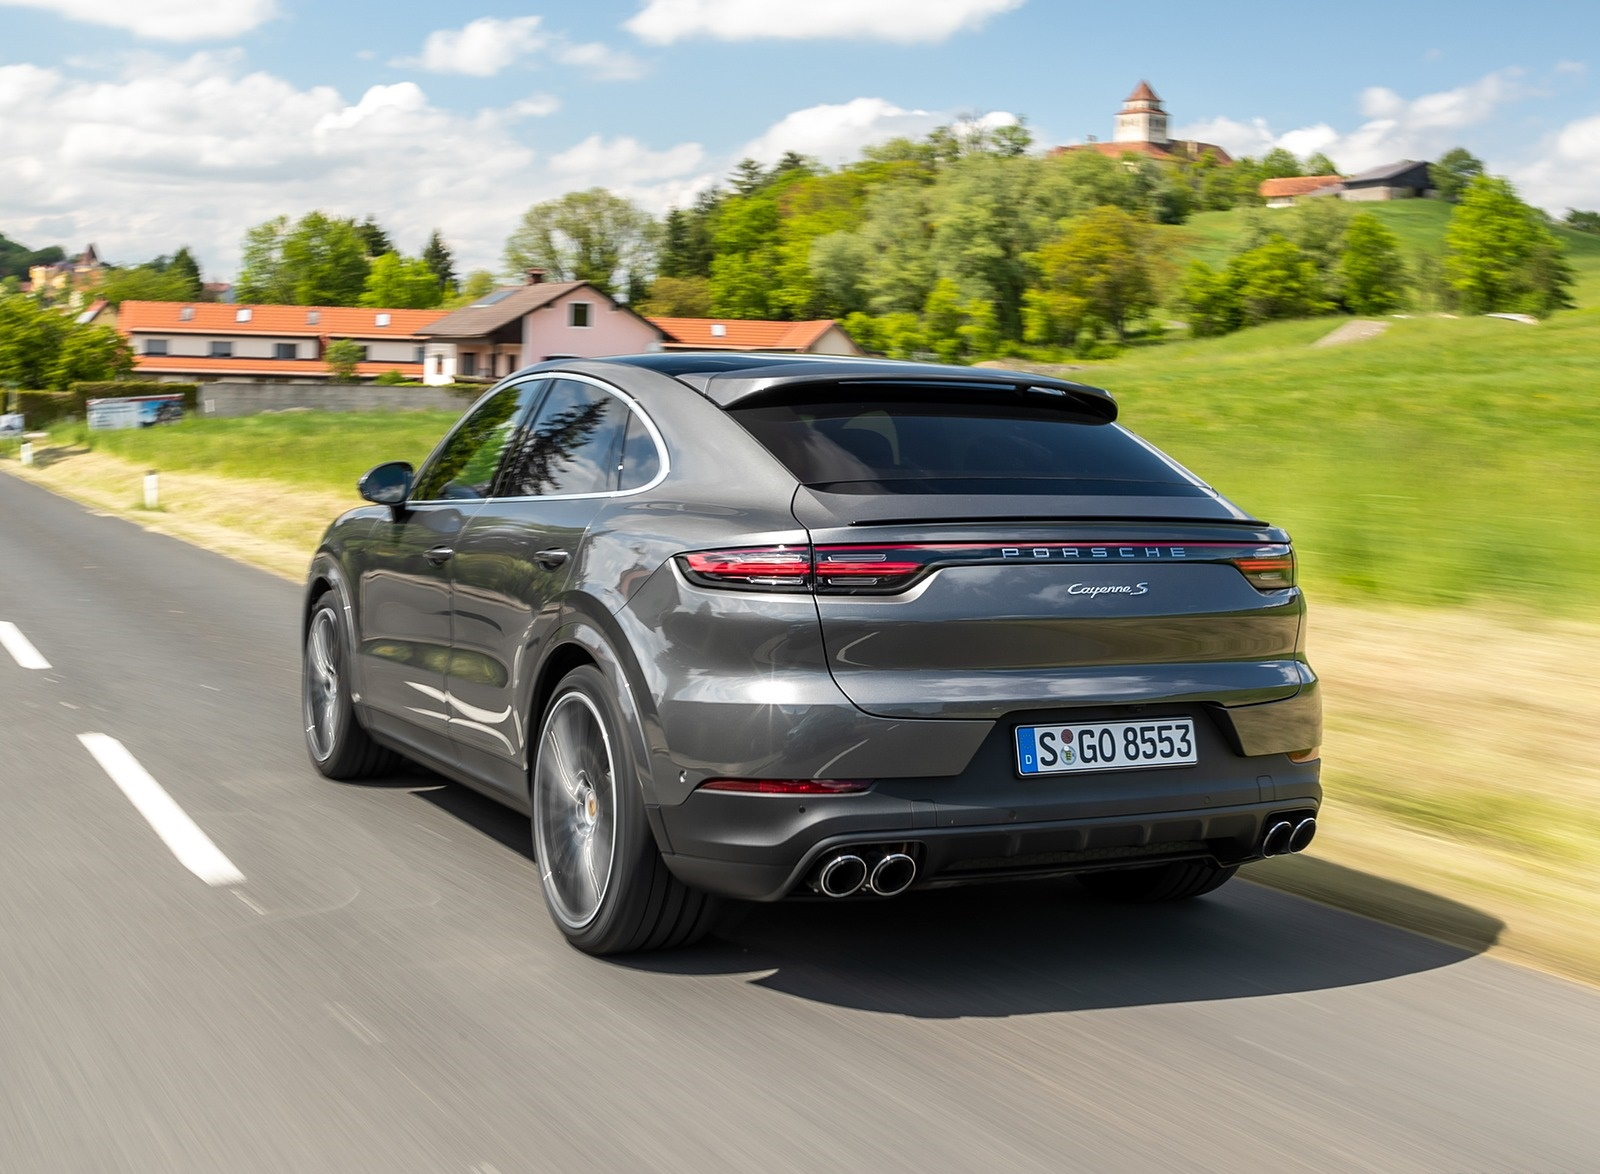 2020 Porsche Cayenne S Coupé (Color: Quarzite Grey Metallic) Rear Three-Quarter Wallpapers (9)